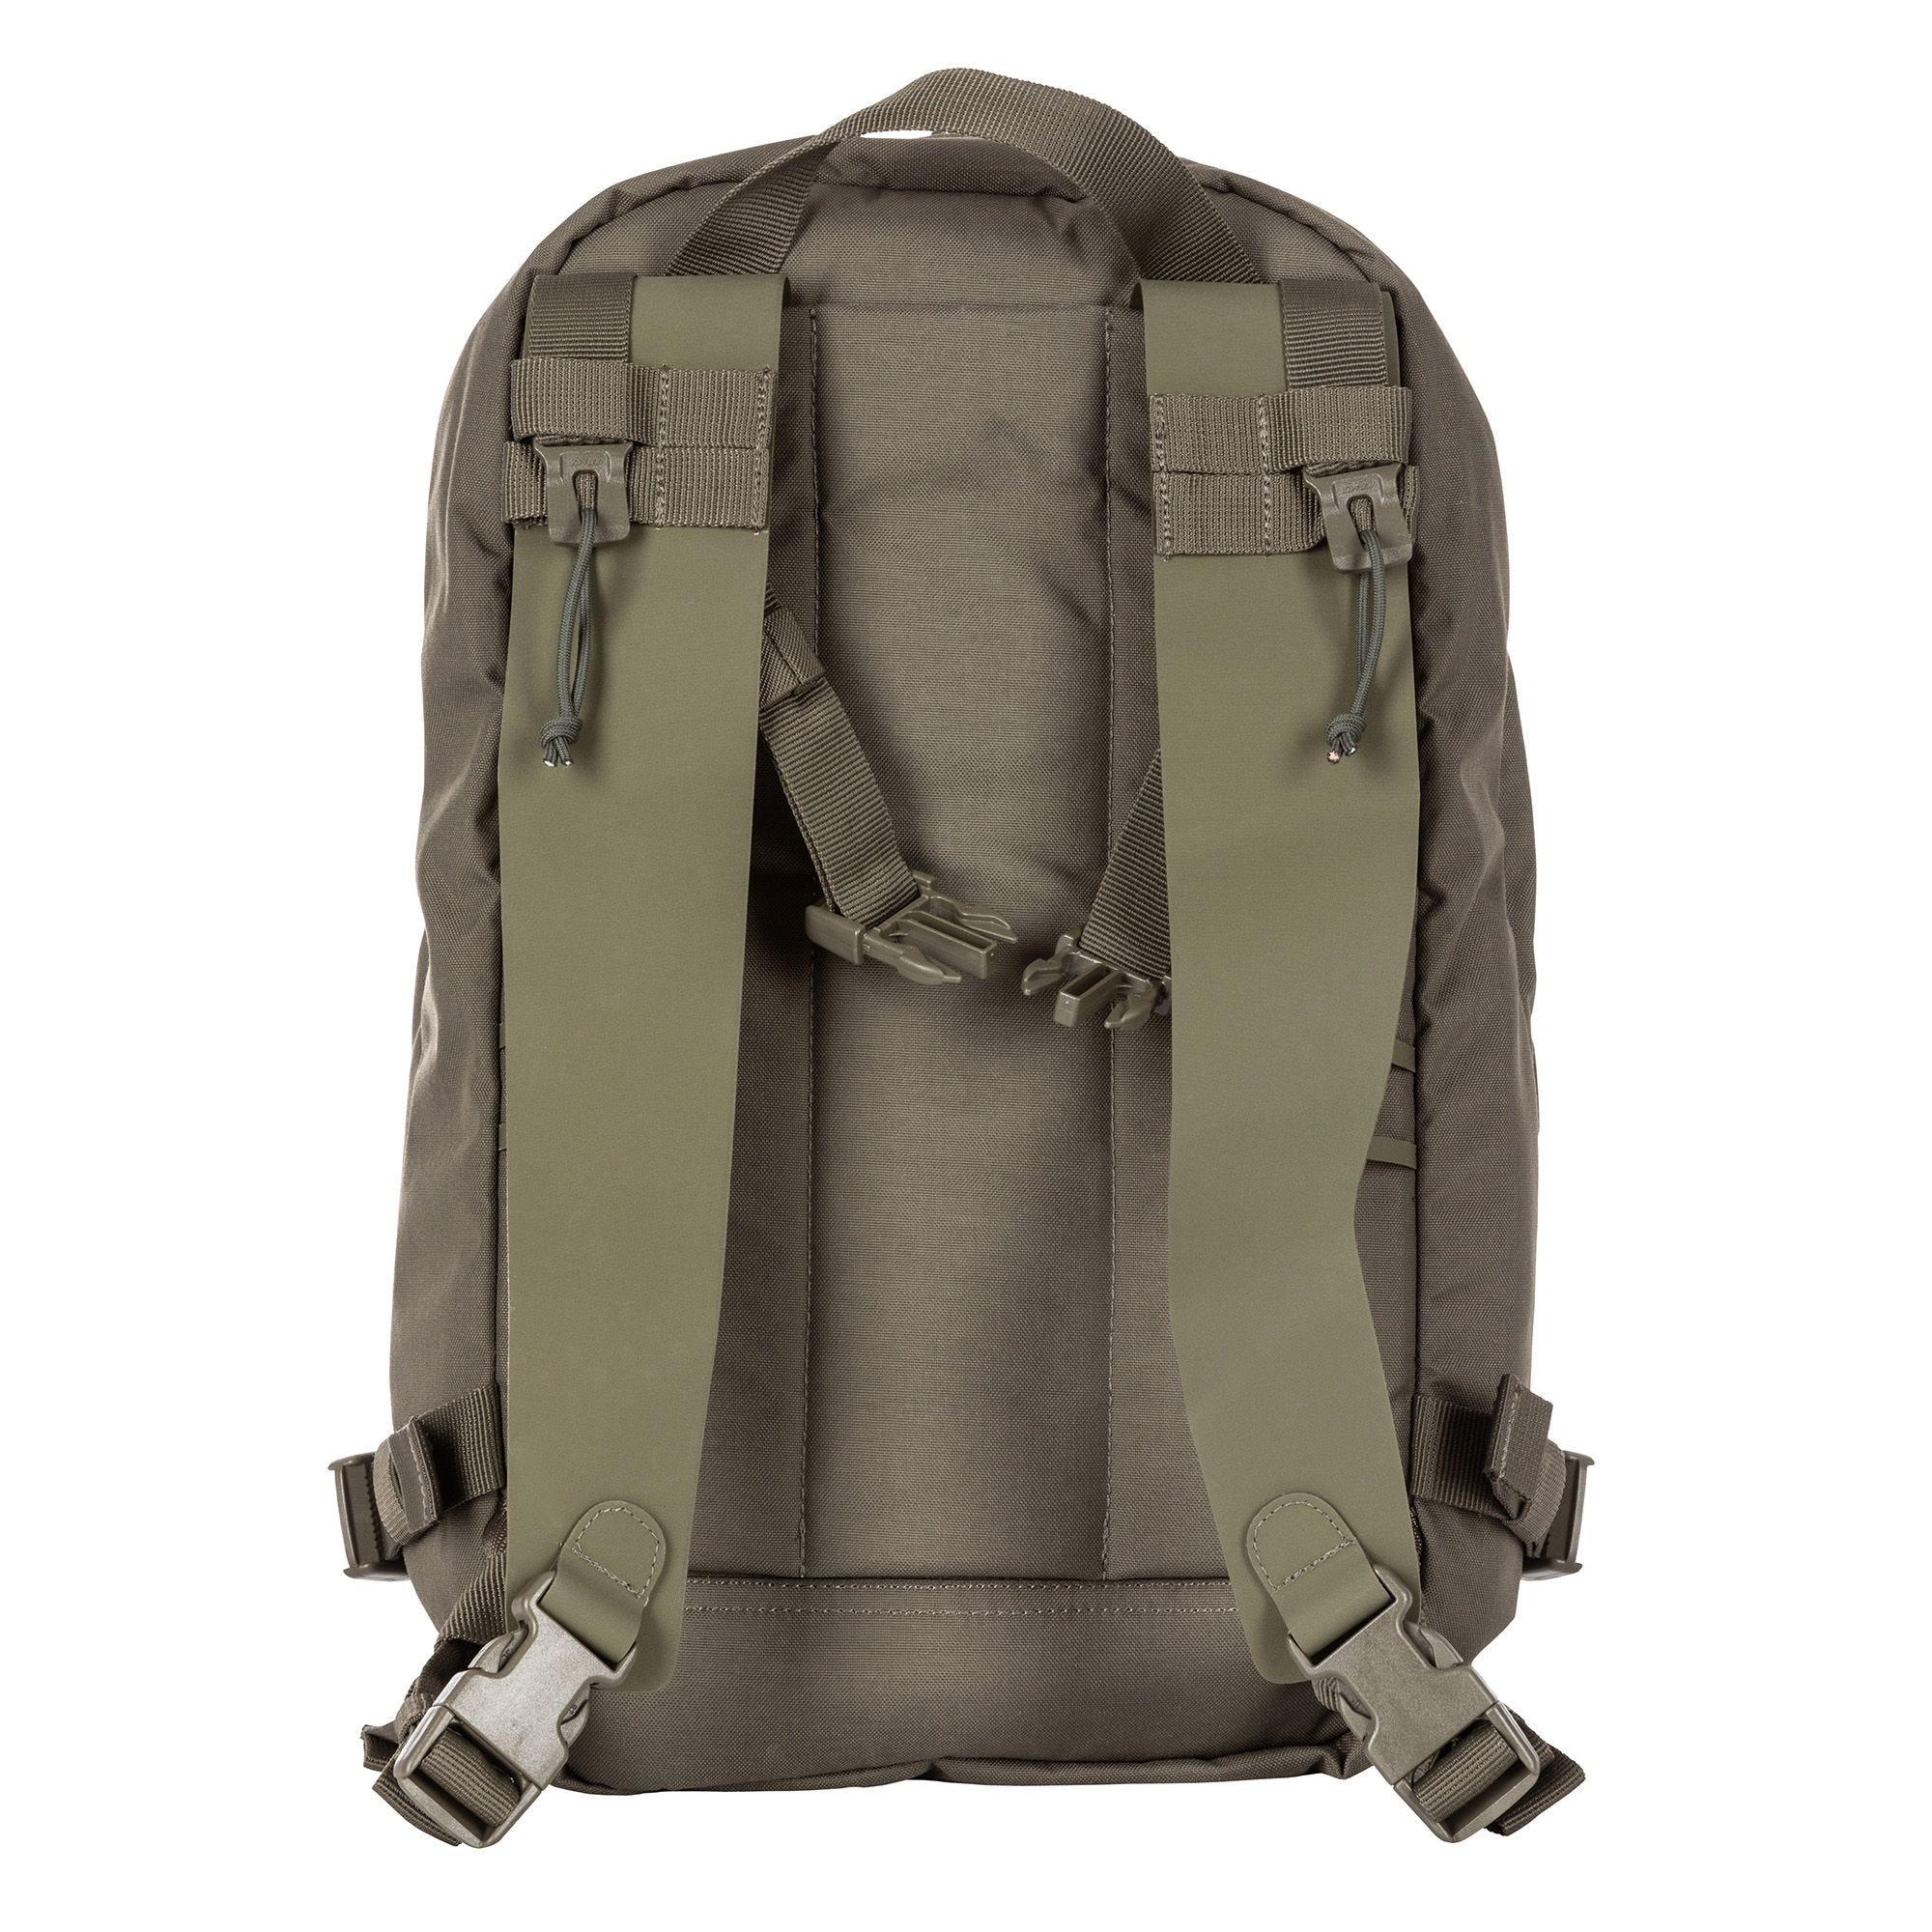 Balo 5.11tactical AMPC PACK 16L – Ranger Green